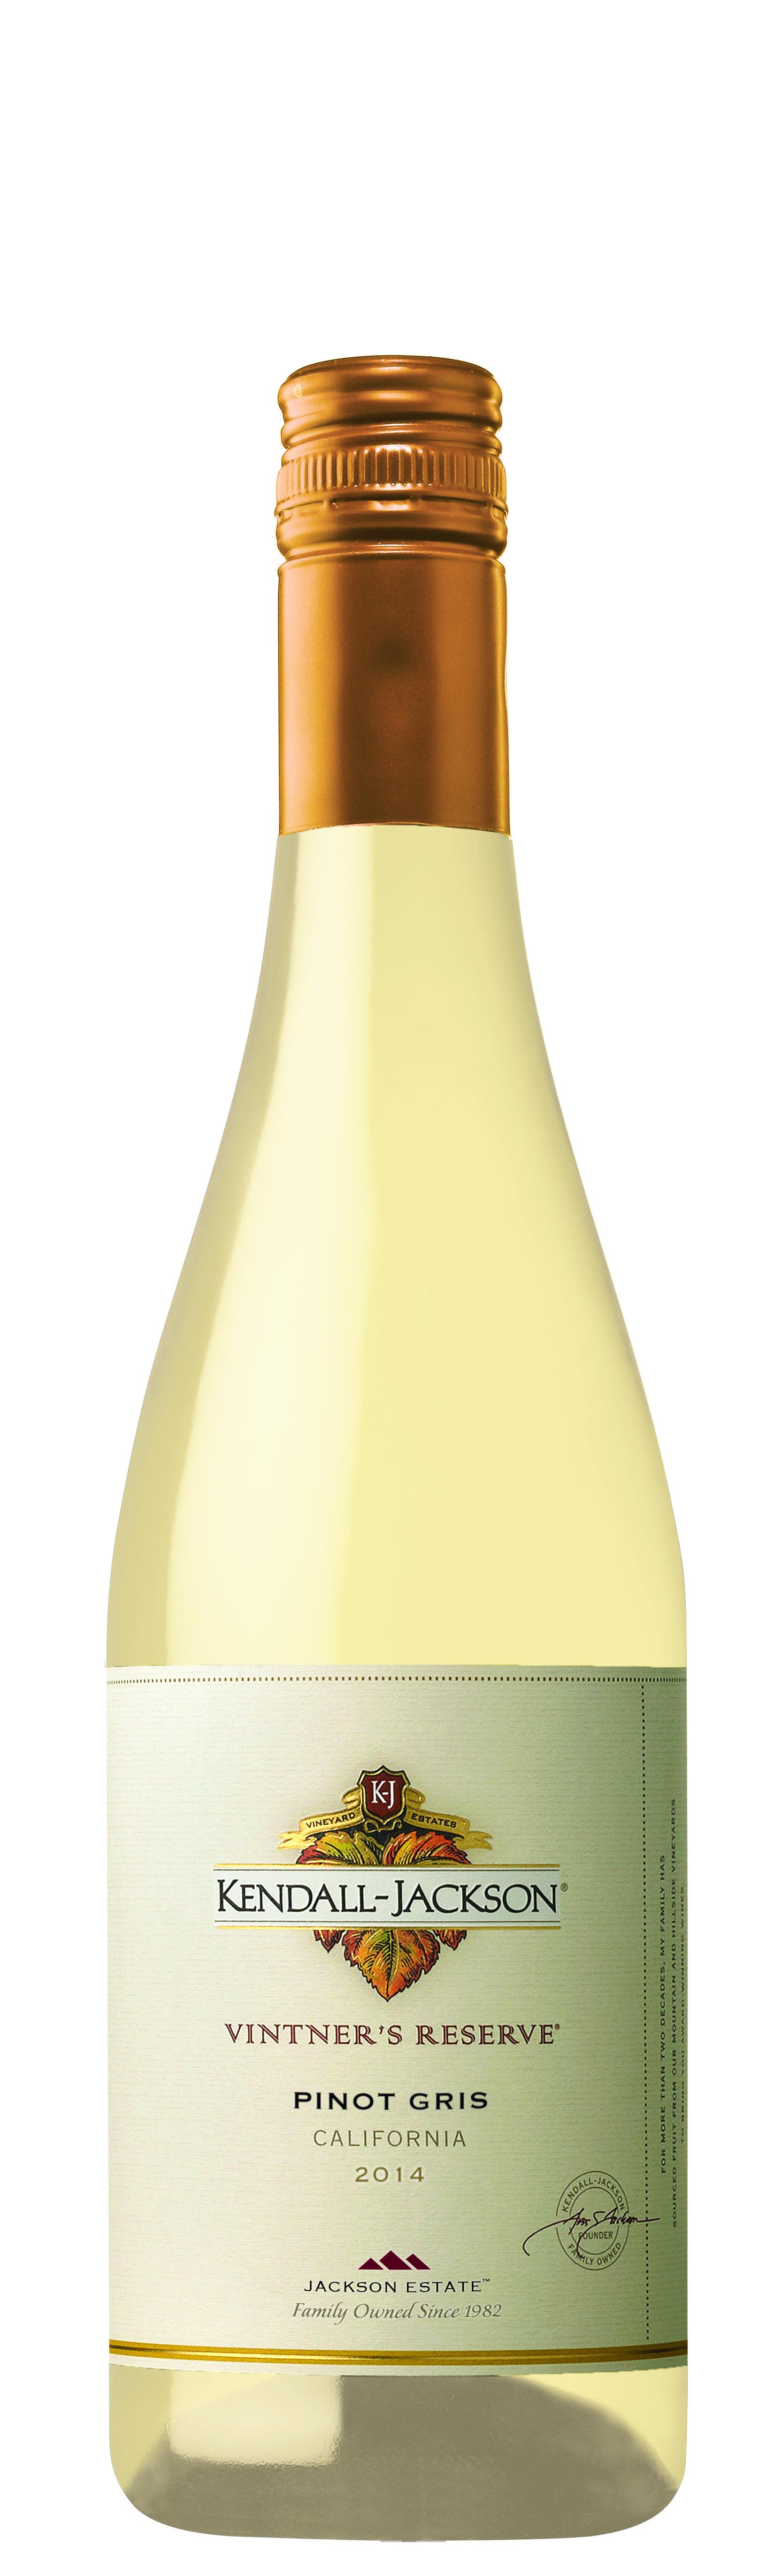 2014 Kendall-Jackson Pinot Gris California Vintner's Reserve